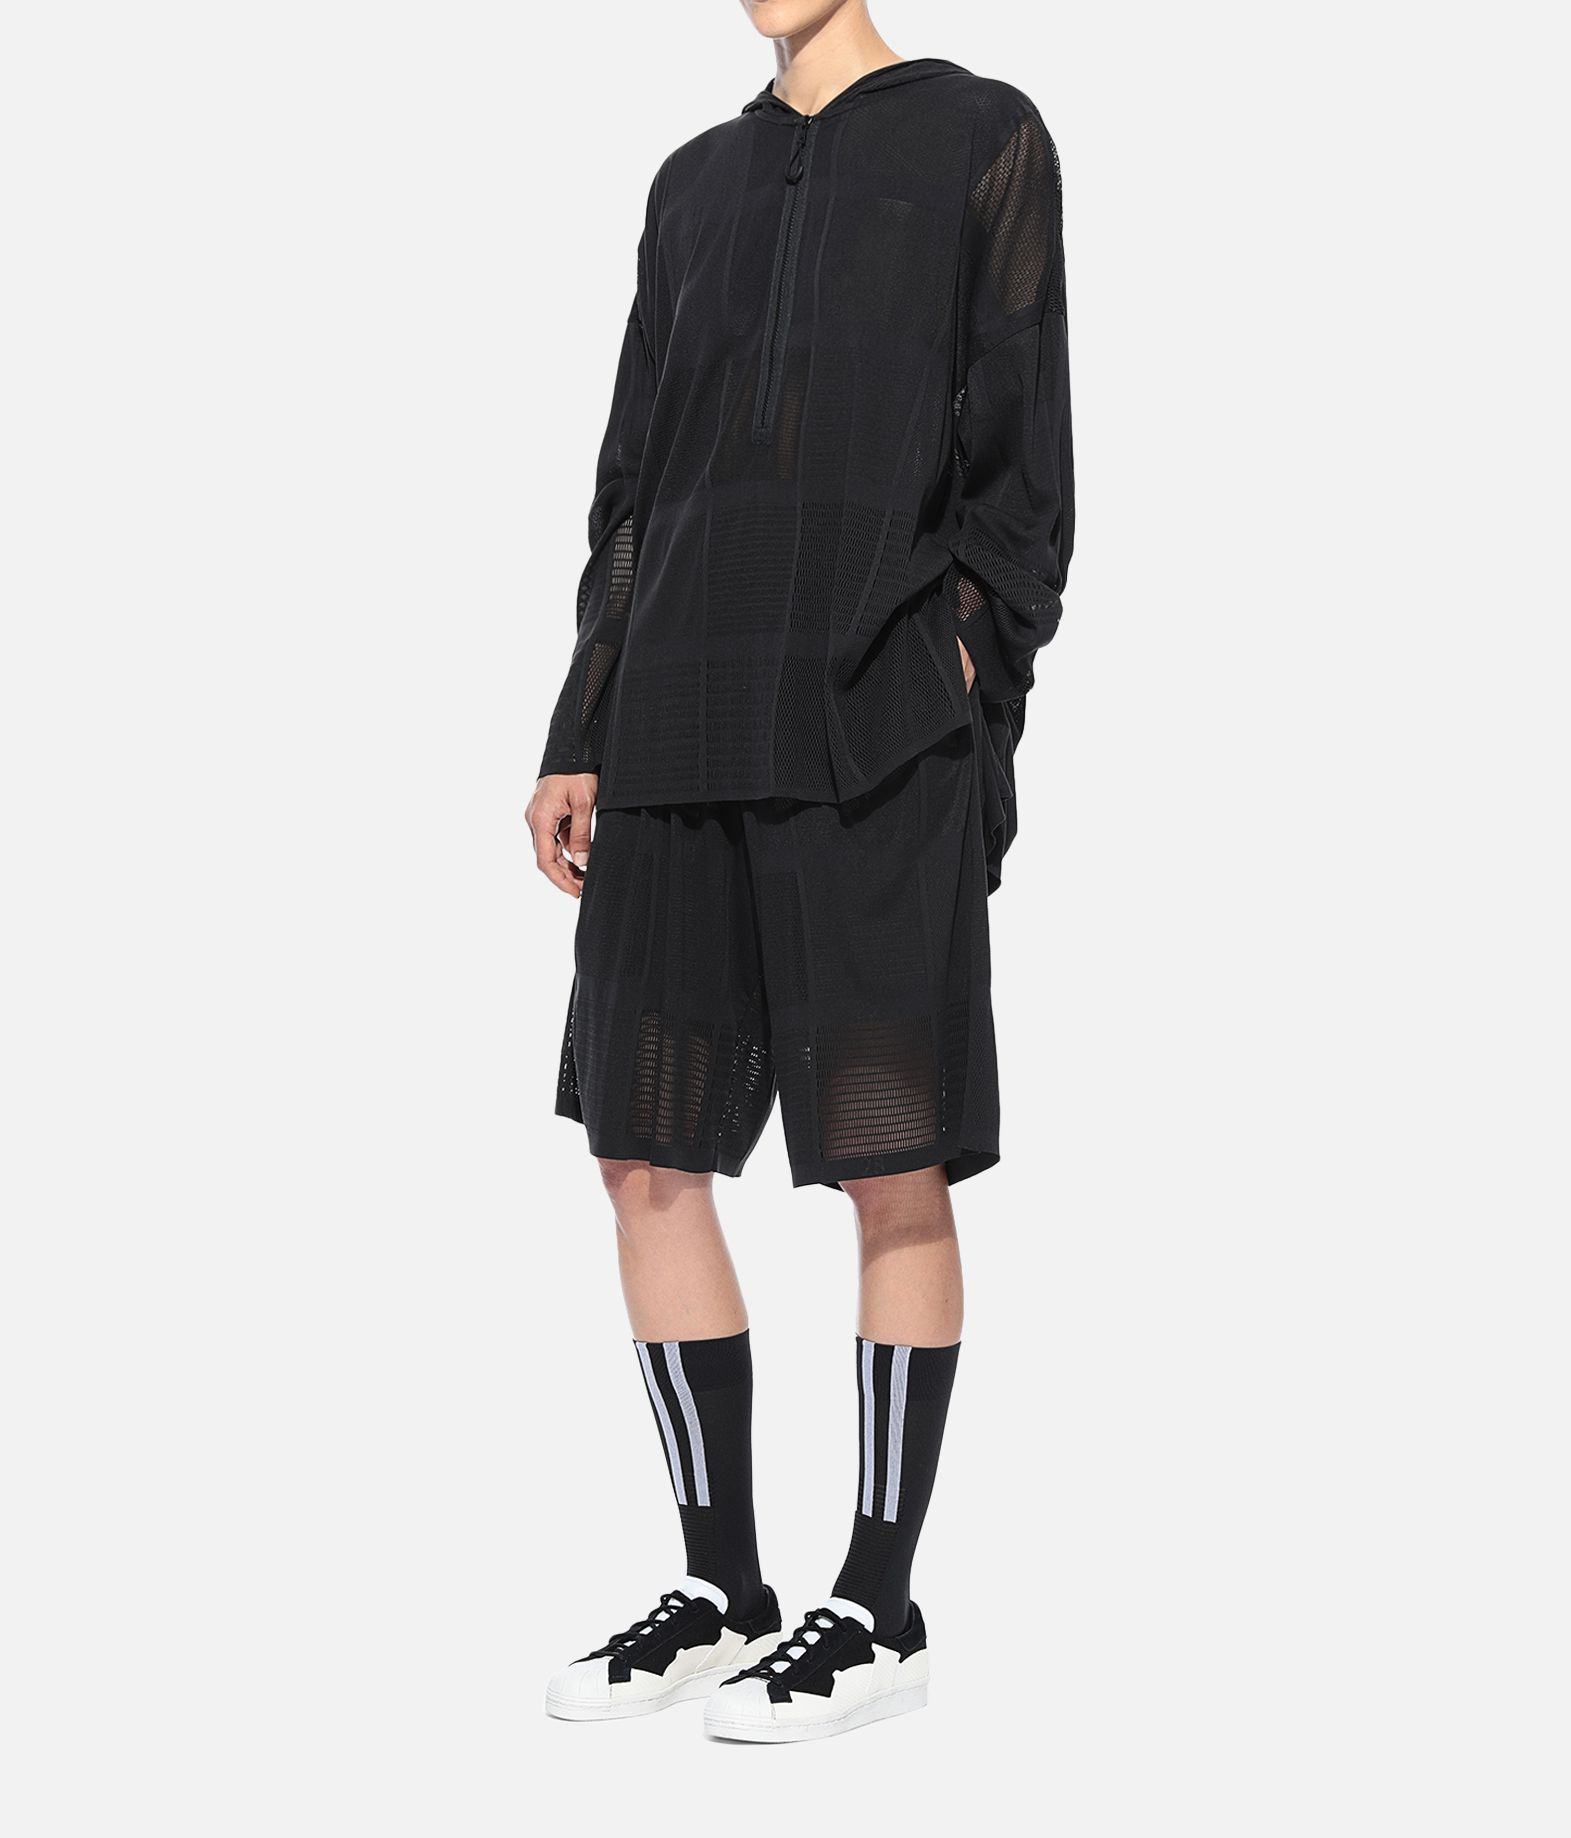 Y-3 Y-3 Patchwork Hoodie Sweatshirt mit Kapuze Damen a